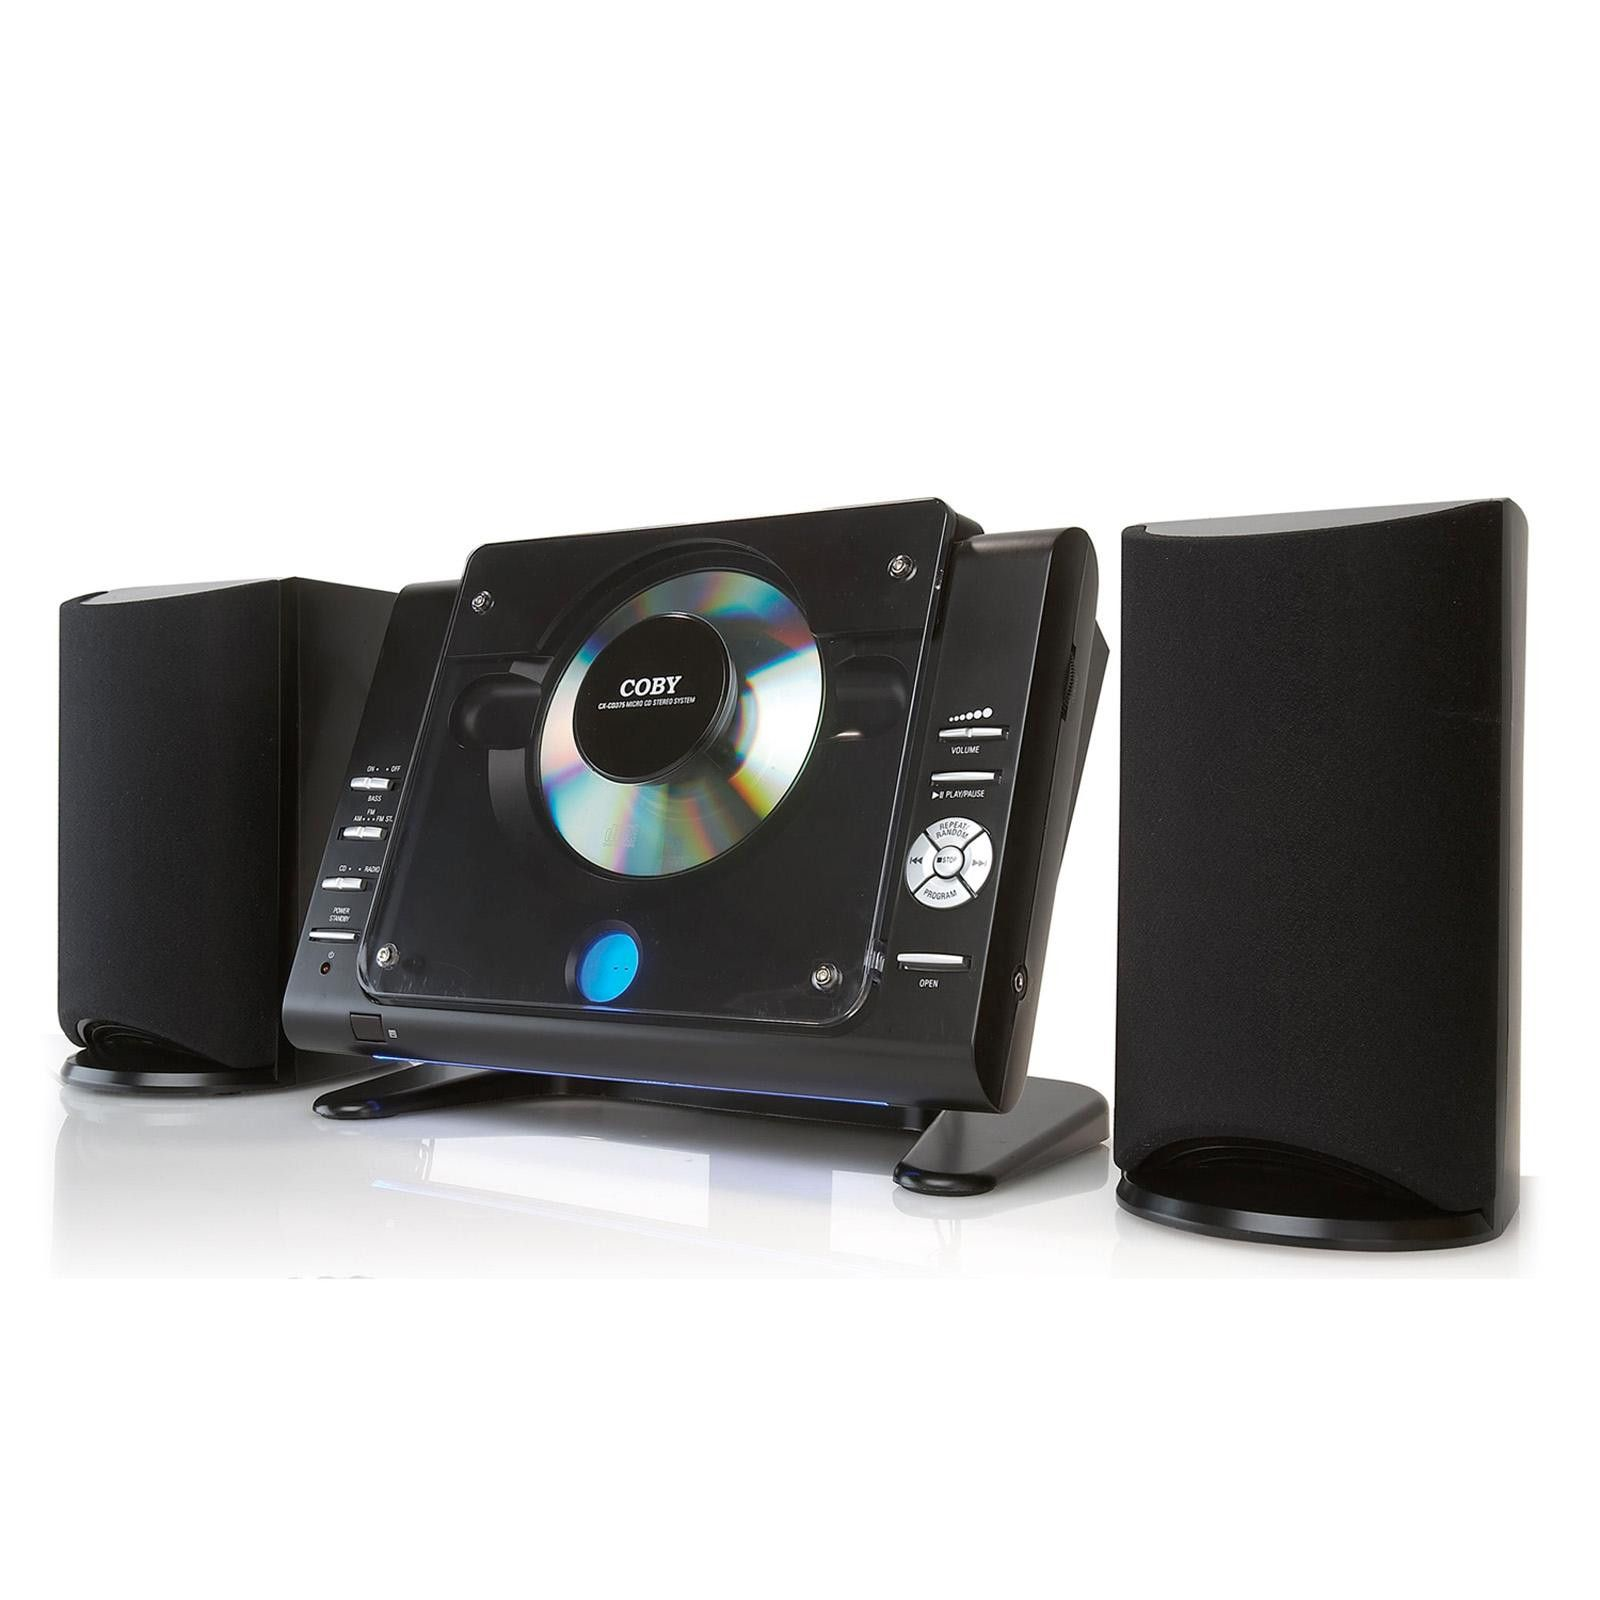 Coby Cxcd377bk Stereo Desktop Mini Audio System (Black